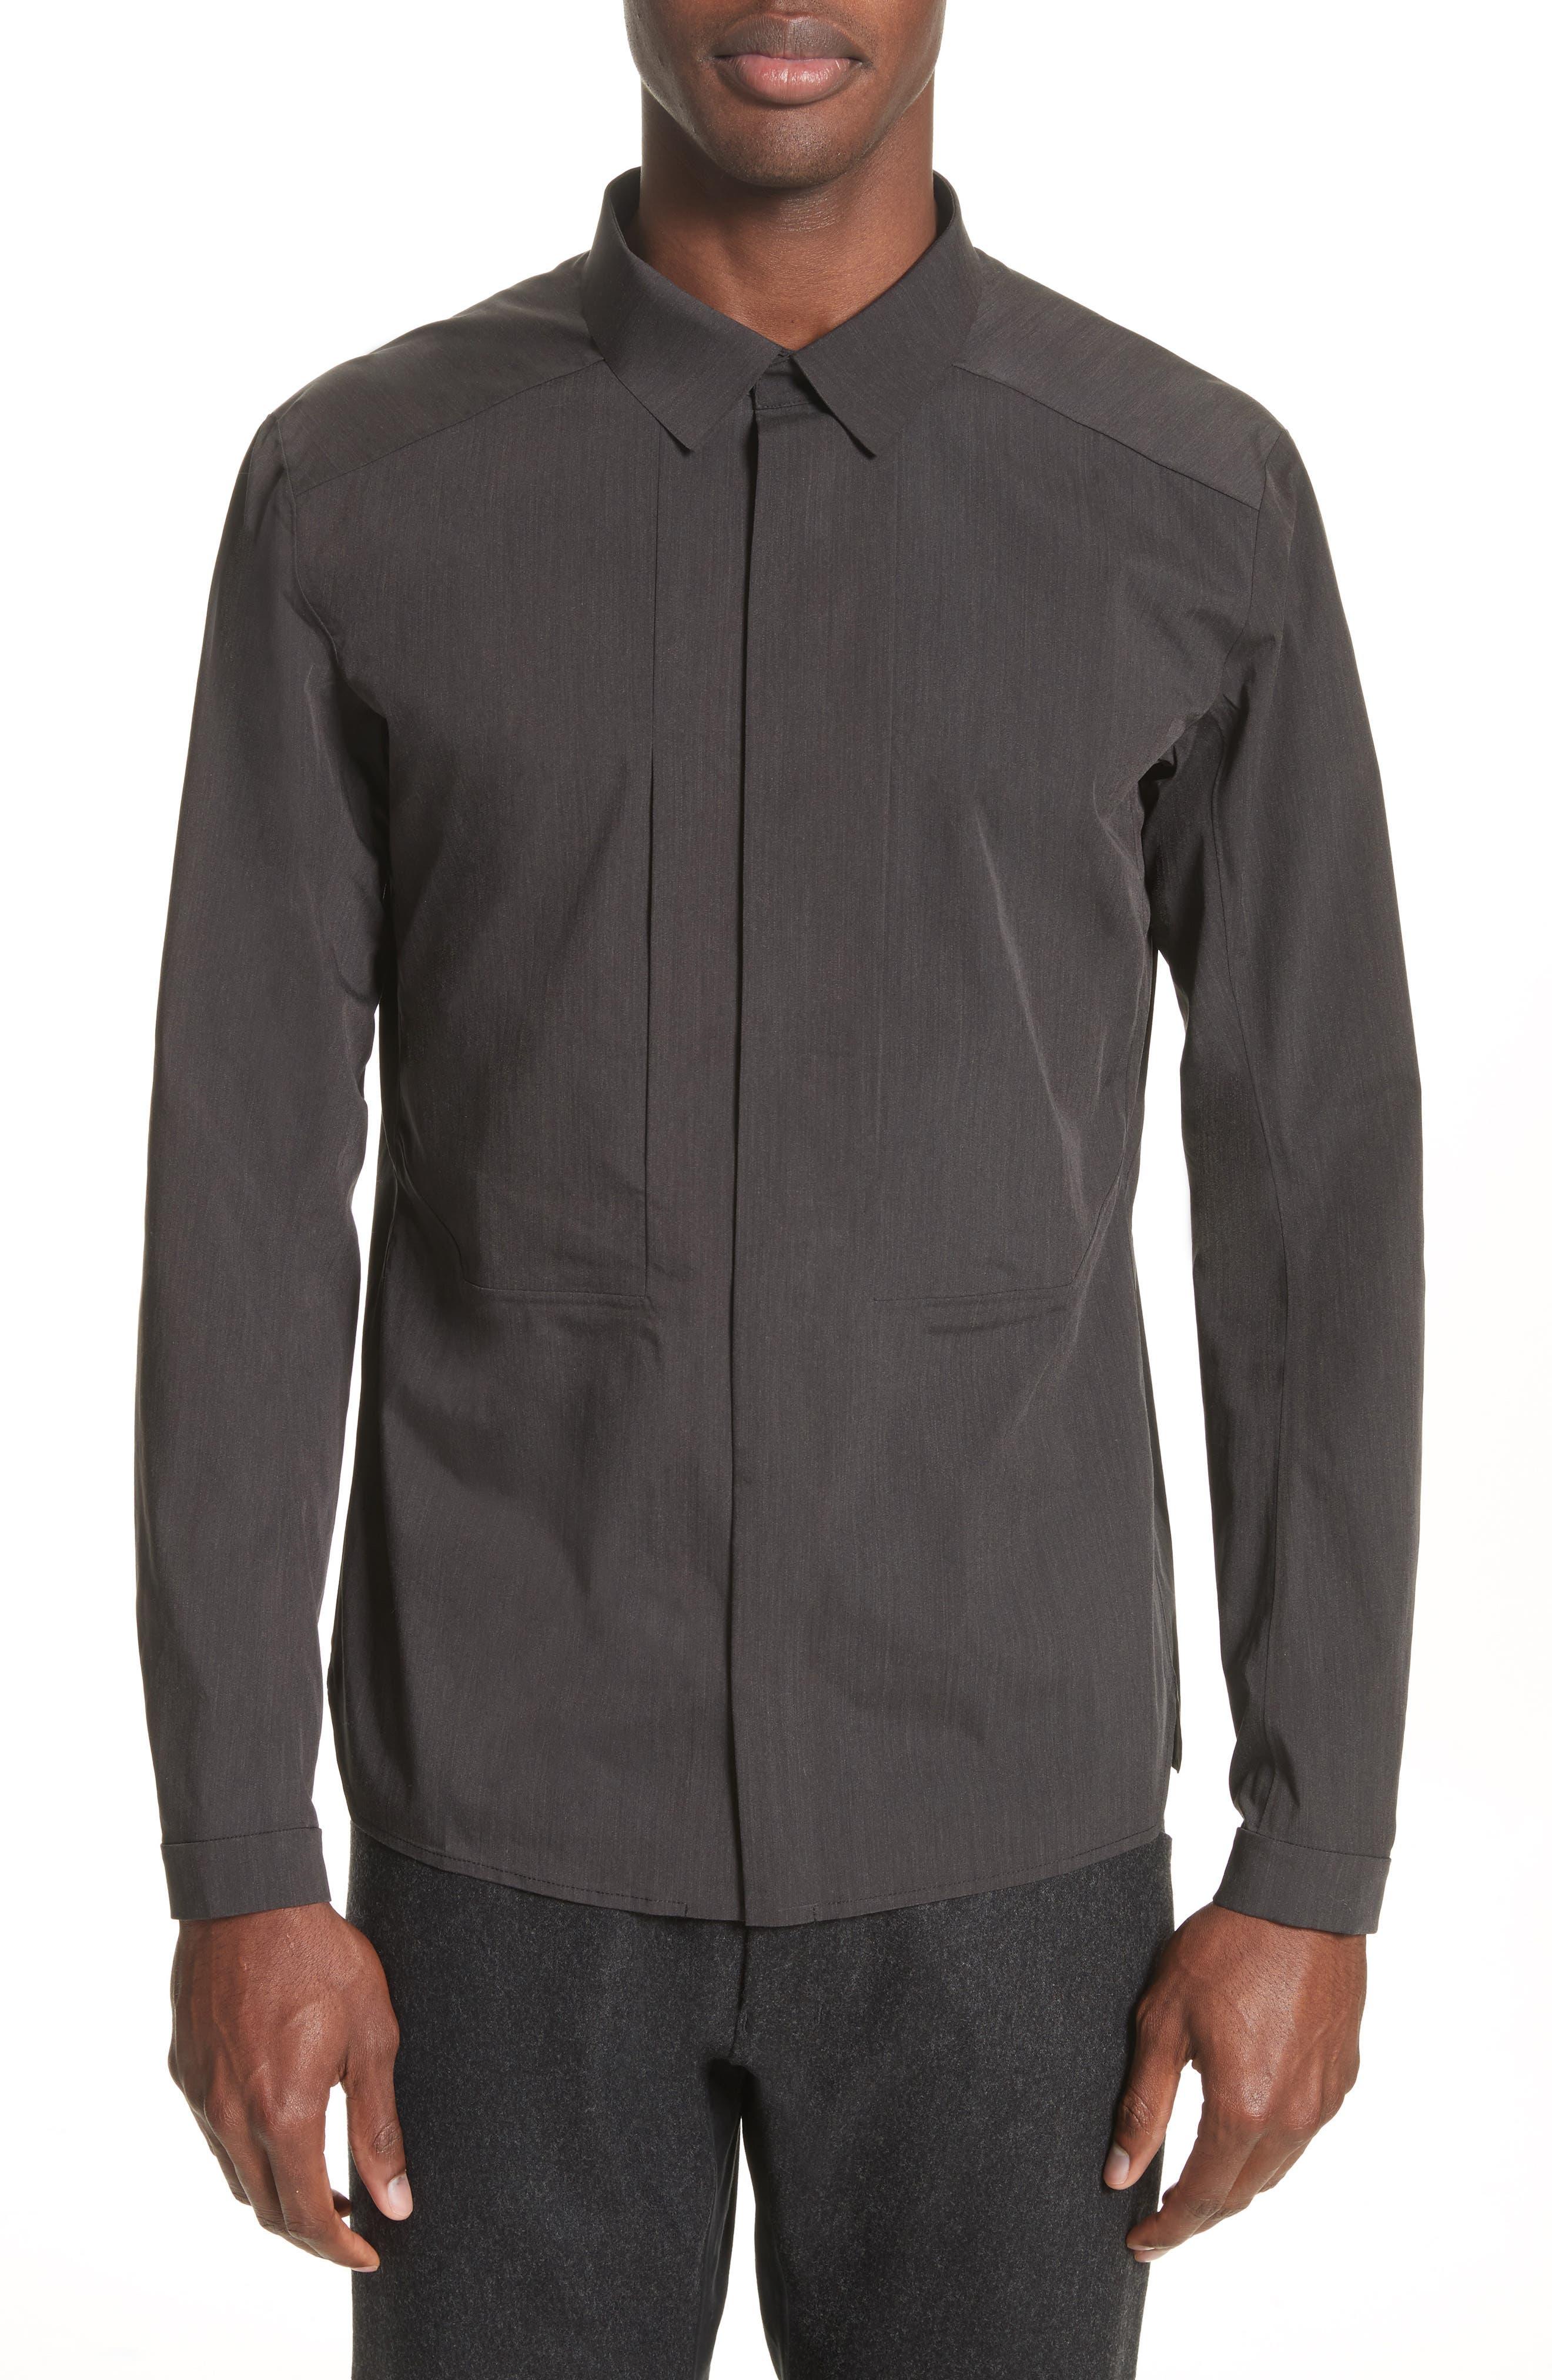 Alternate Image 1 Selected - Arc'teryx Veilance Operand Utility Shirt